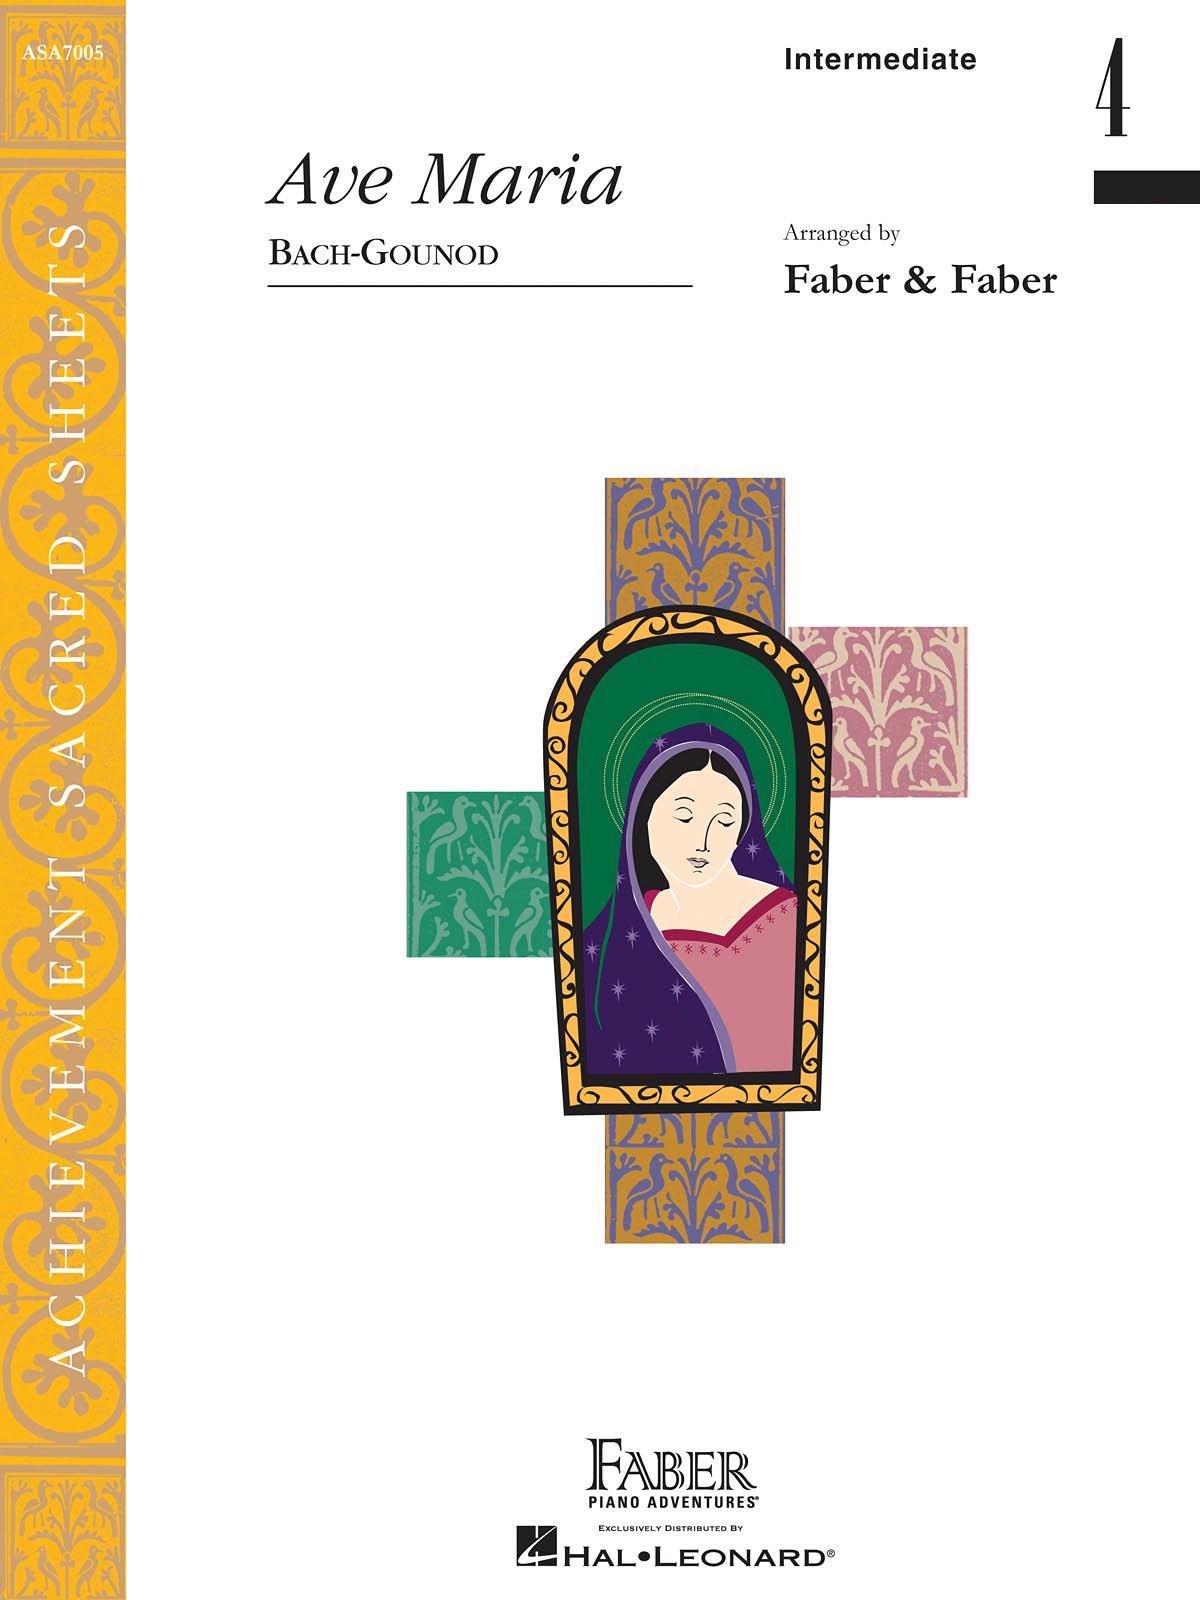 Charles Gounod Johann Sebastian Bach: Ave Maria Intermediate-Level 4 Piano Solo: